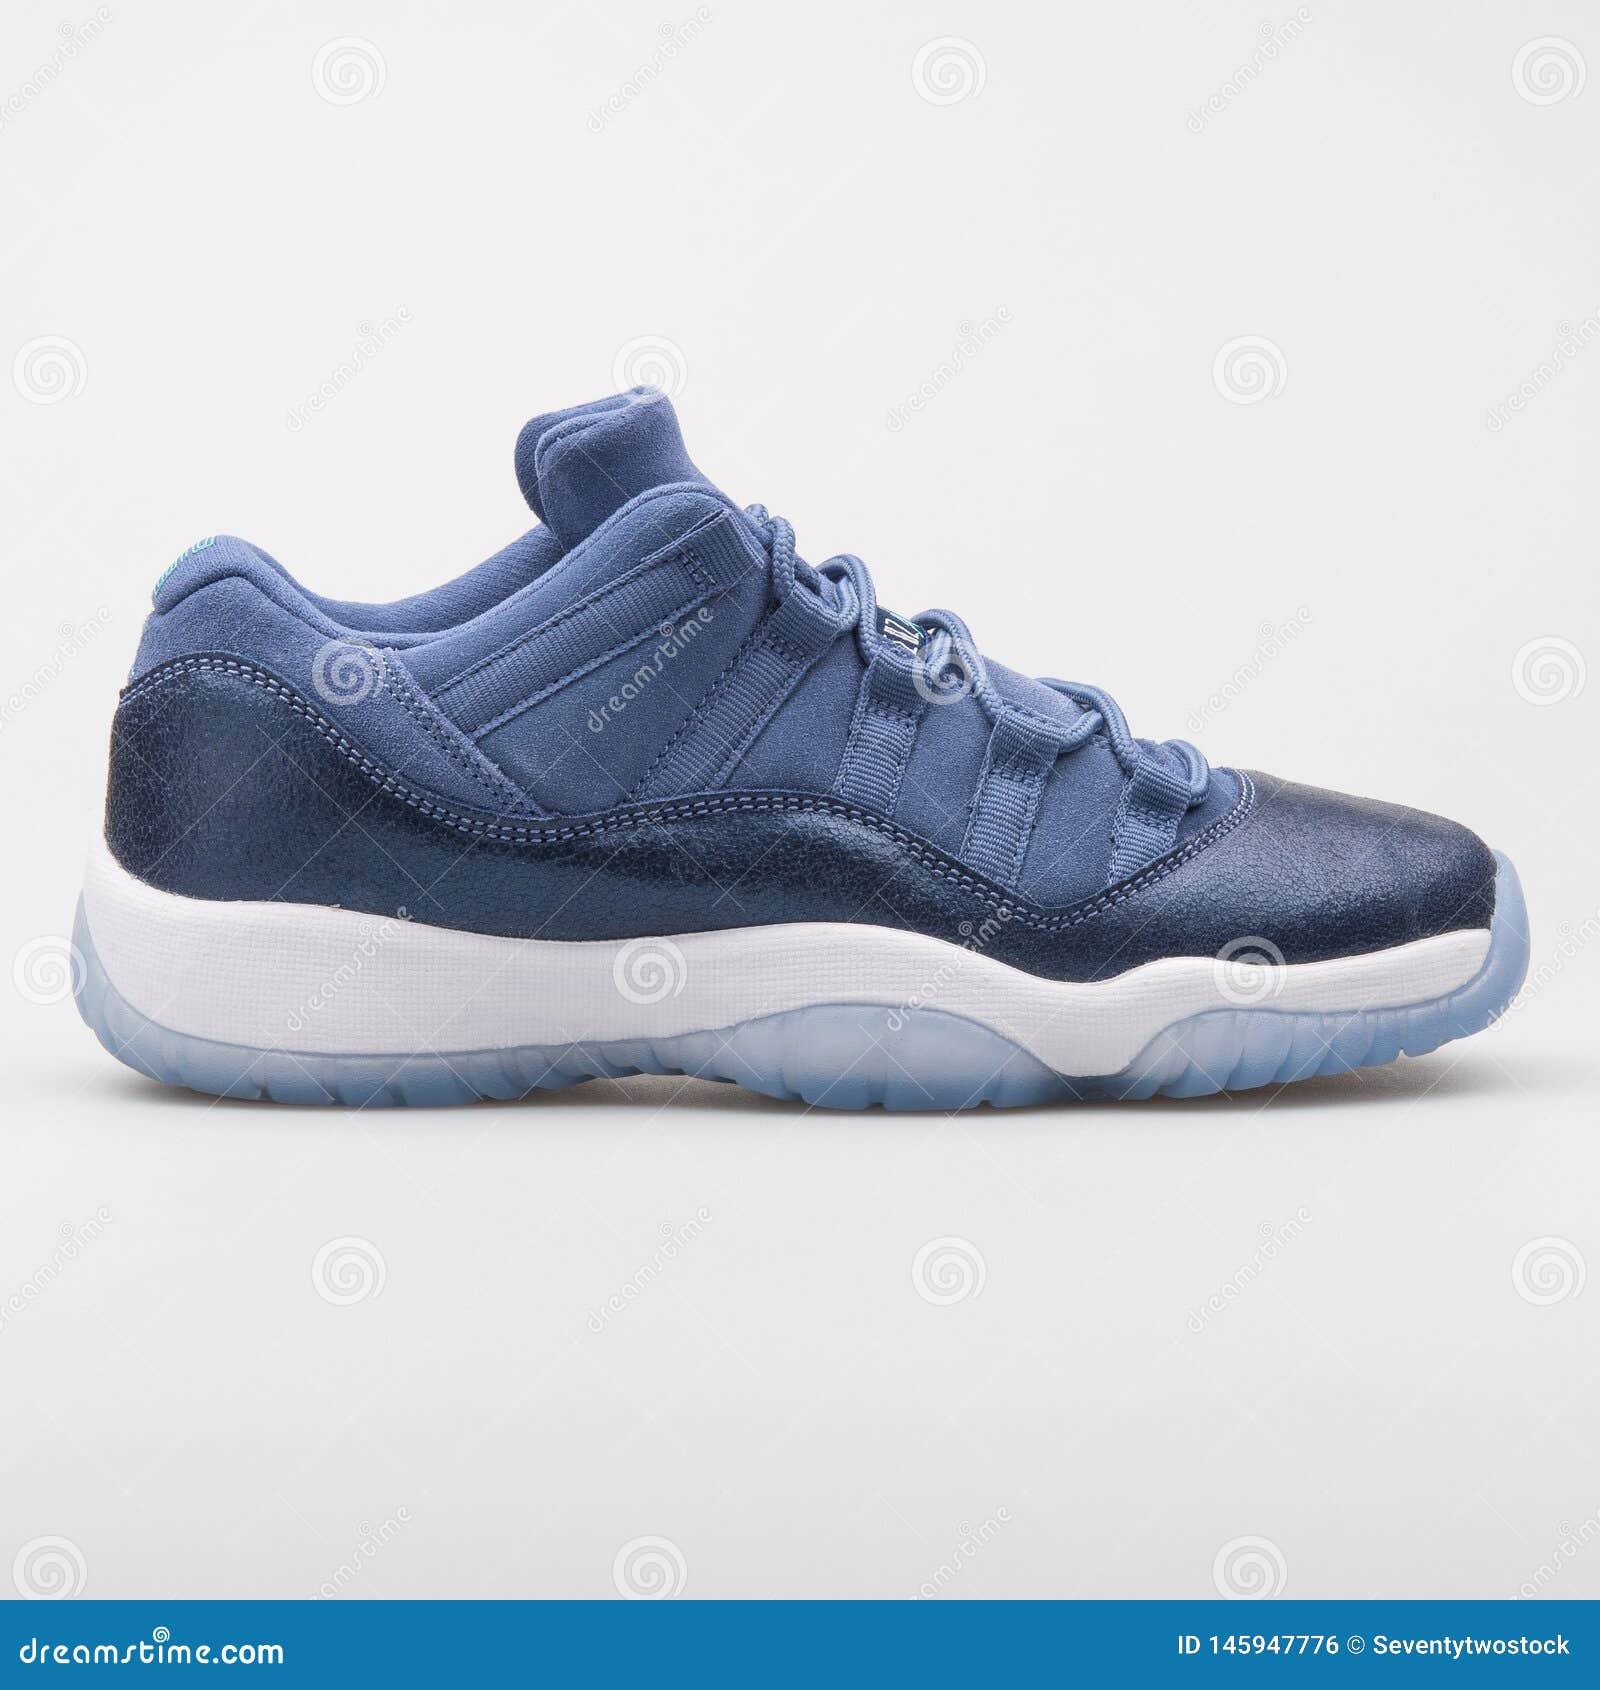 super cute 1788e 7c159 Nike Air Jordan 11 Retro Low GG Blue Sneaker Editorial Photo ...